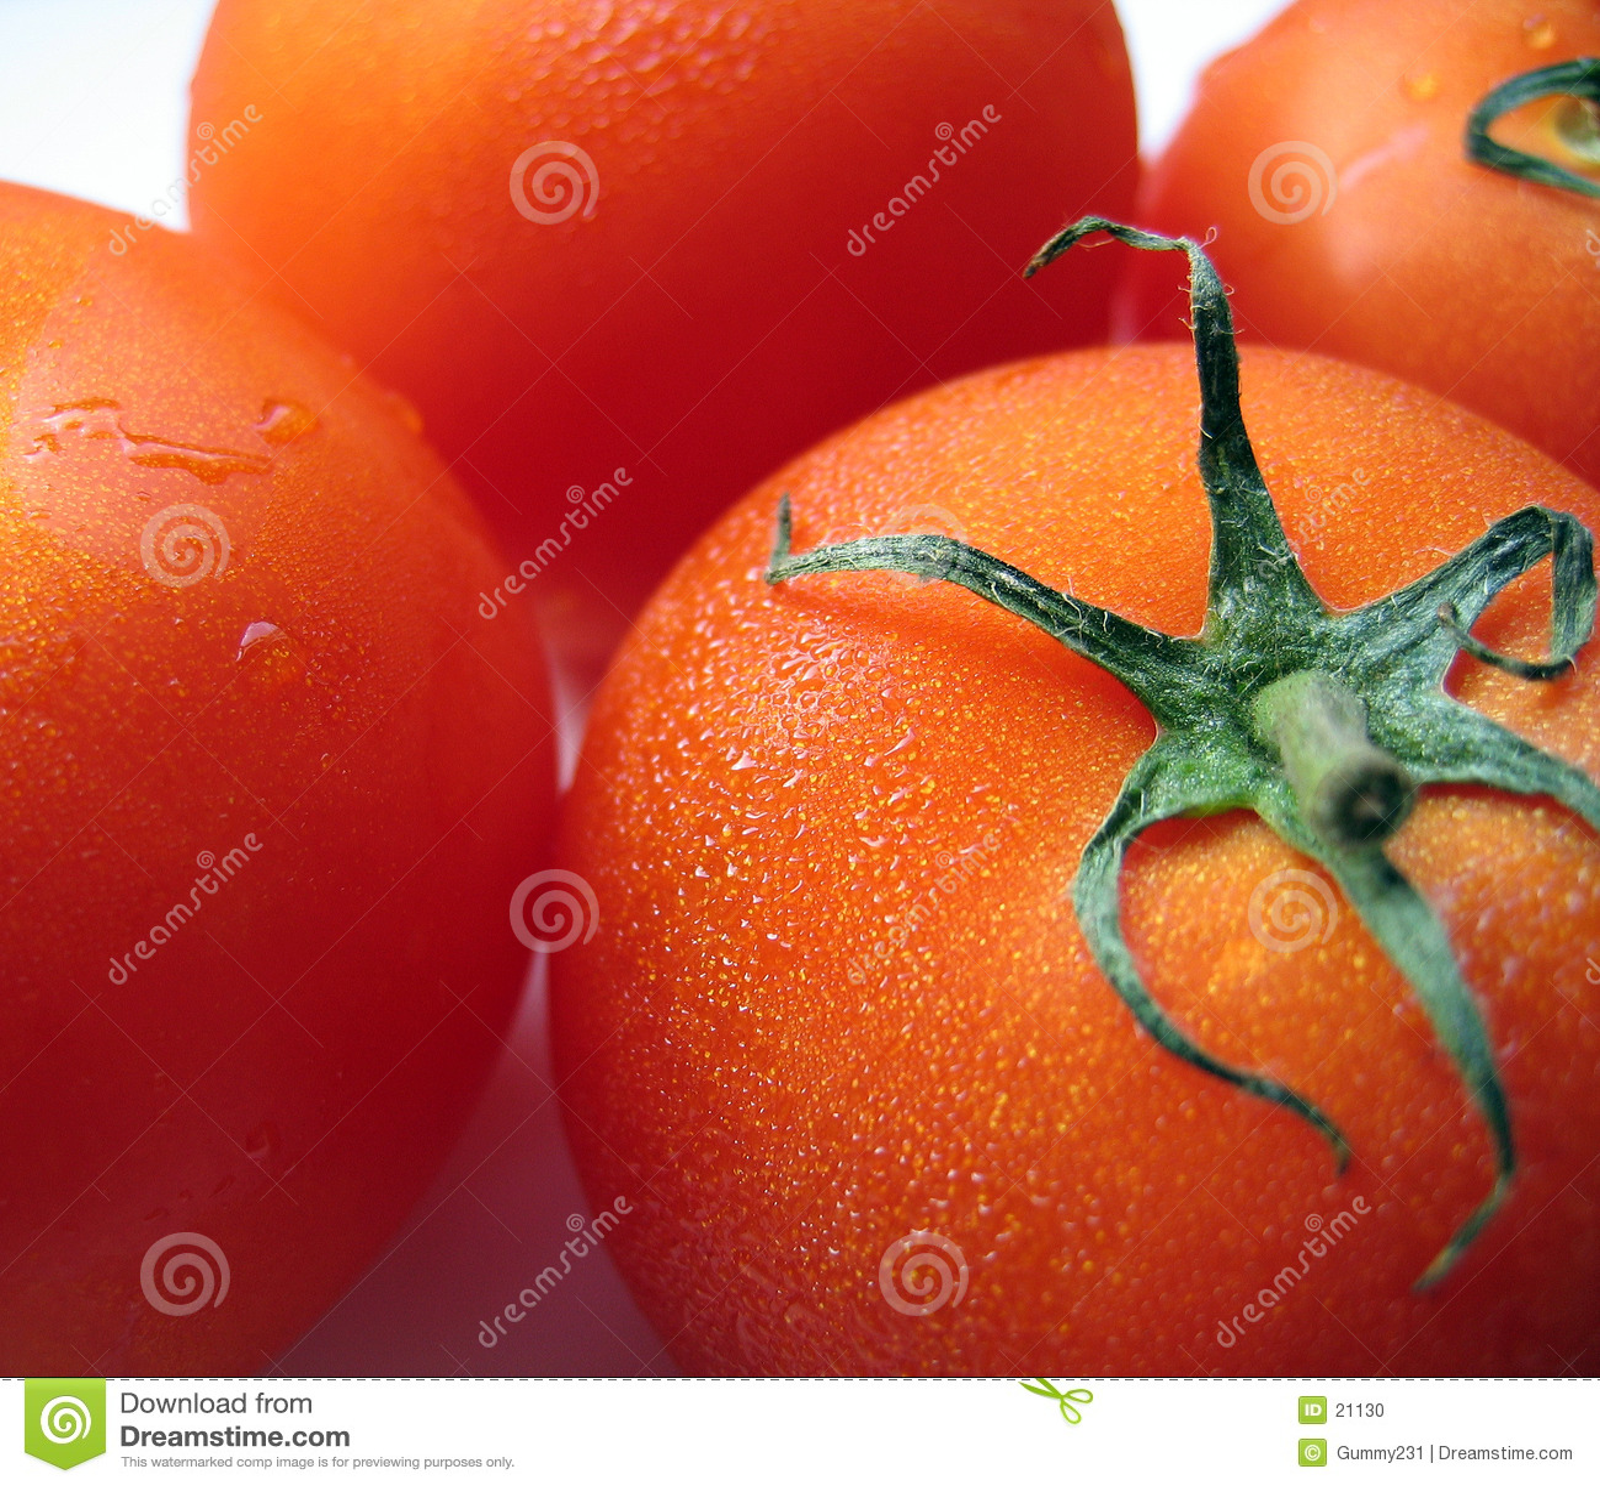 Plump Ripe Tomatoes